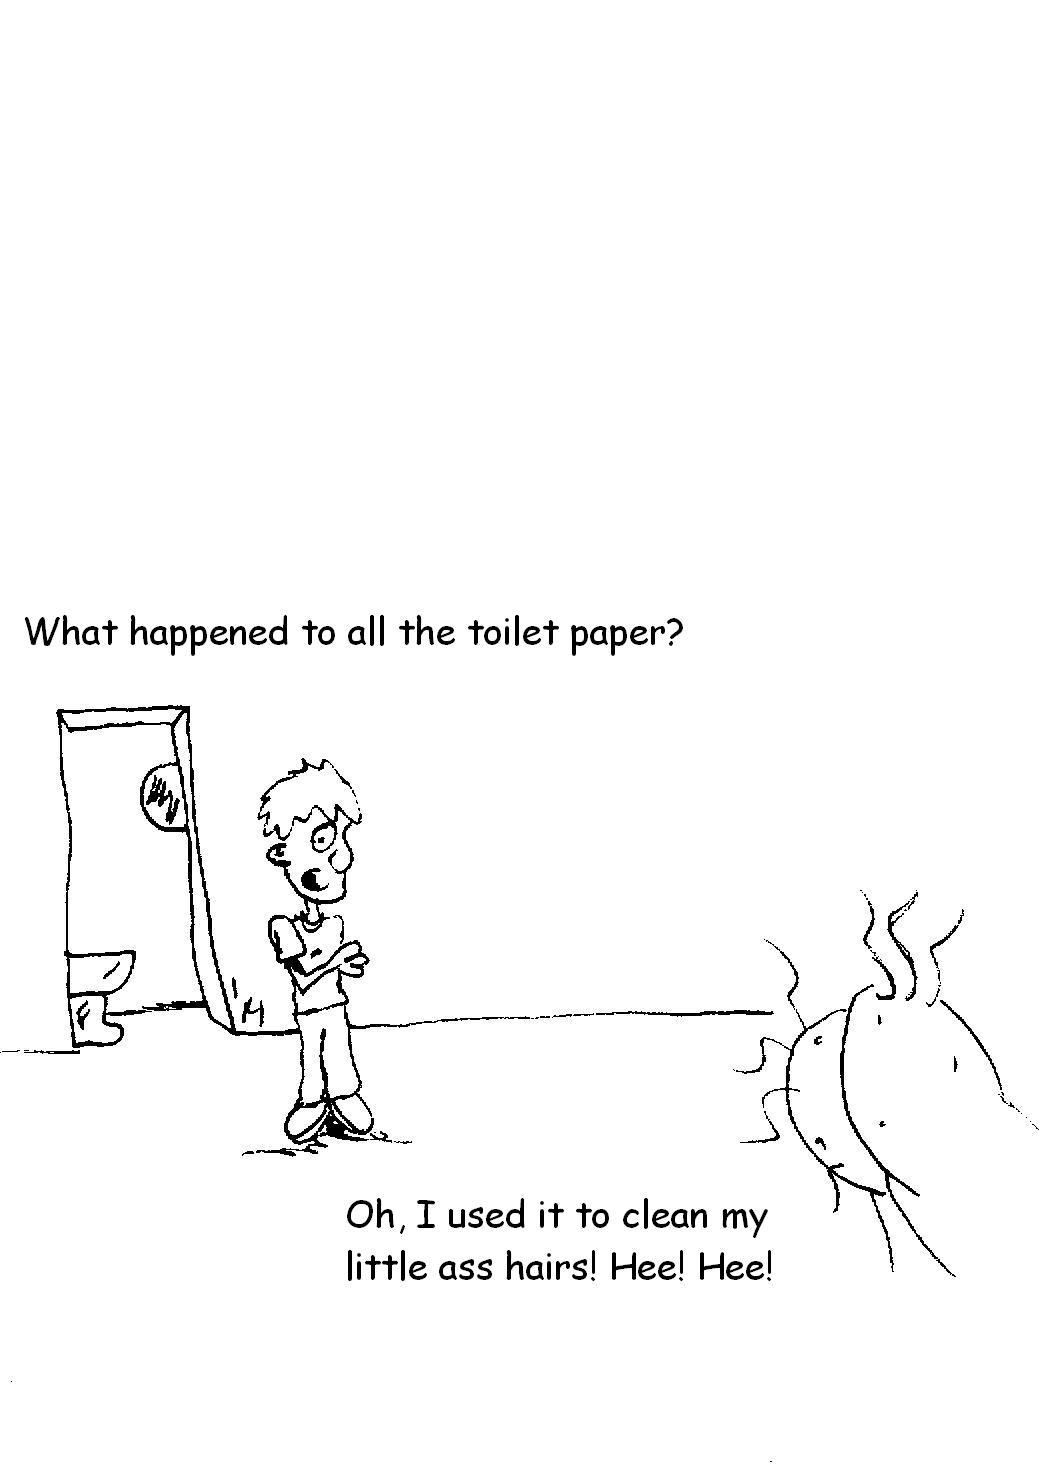 wipe the hairs